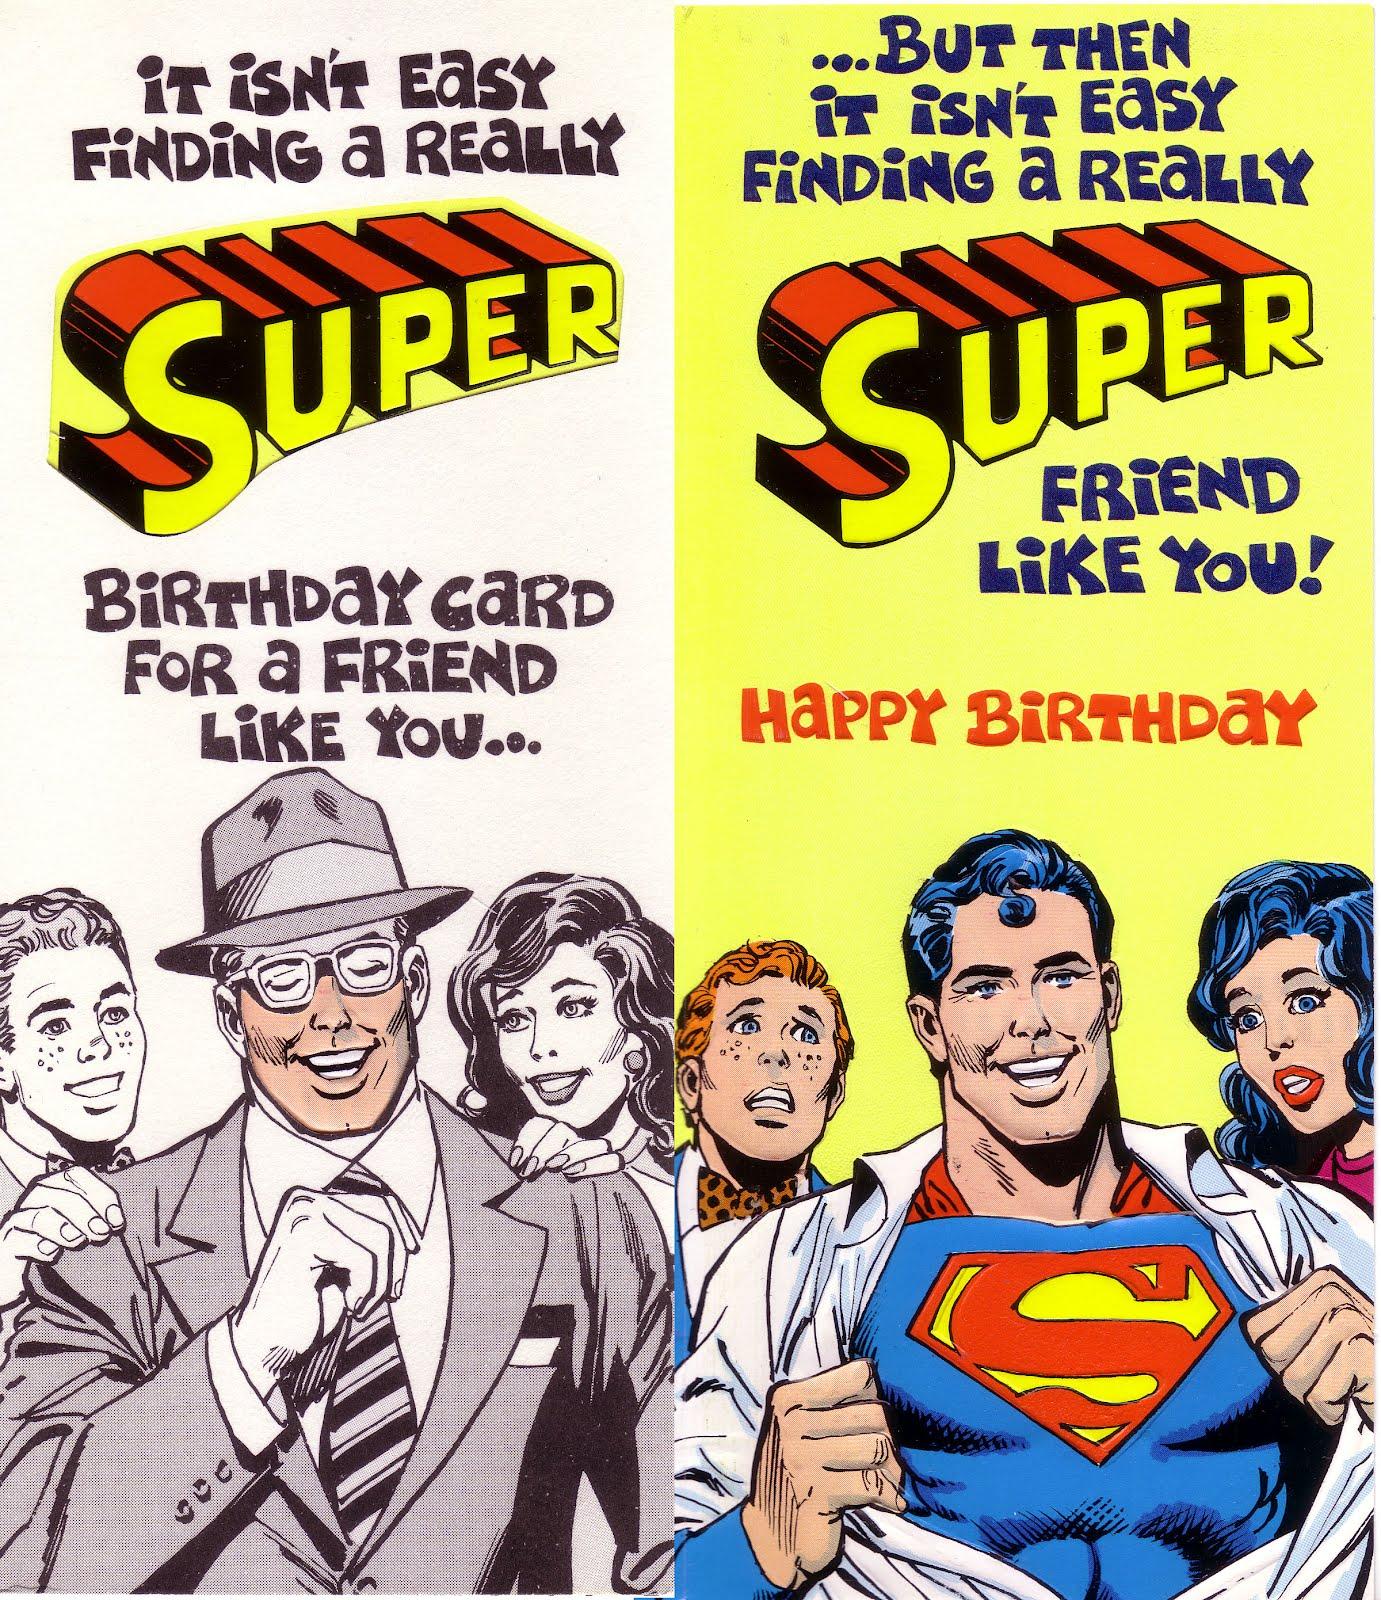 Birthday5g 13811600 superhero cards pinterest superhero kristyandbryce Image collections